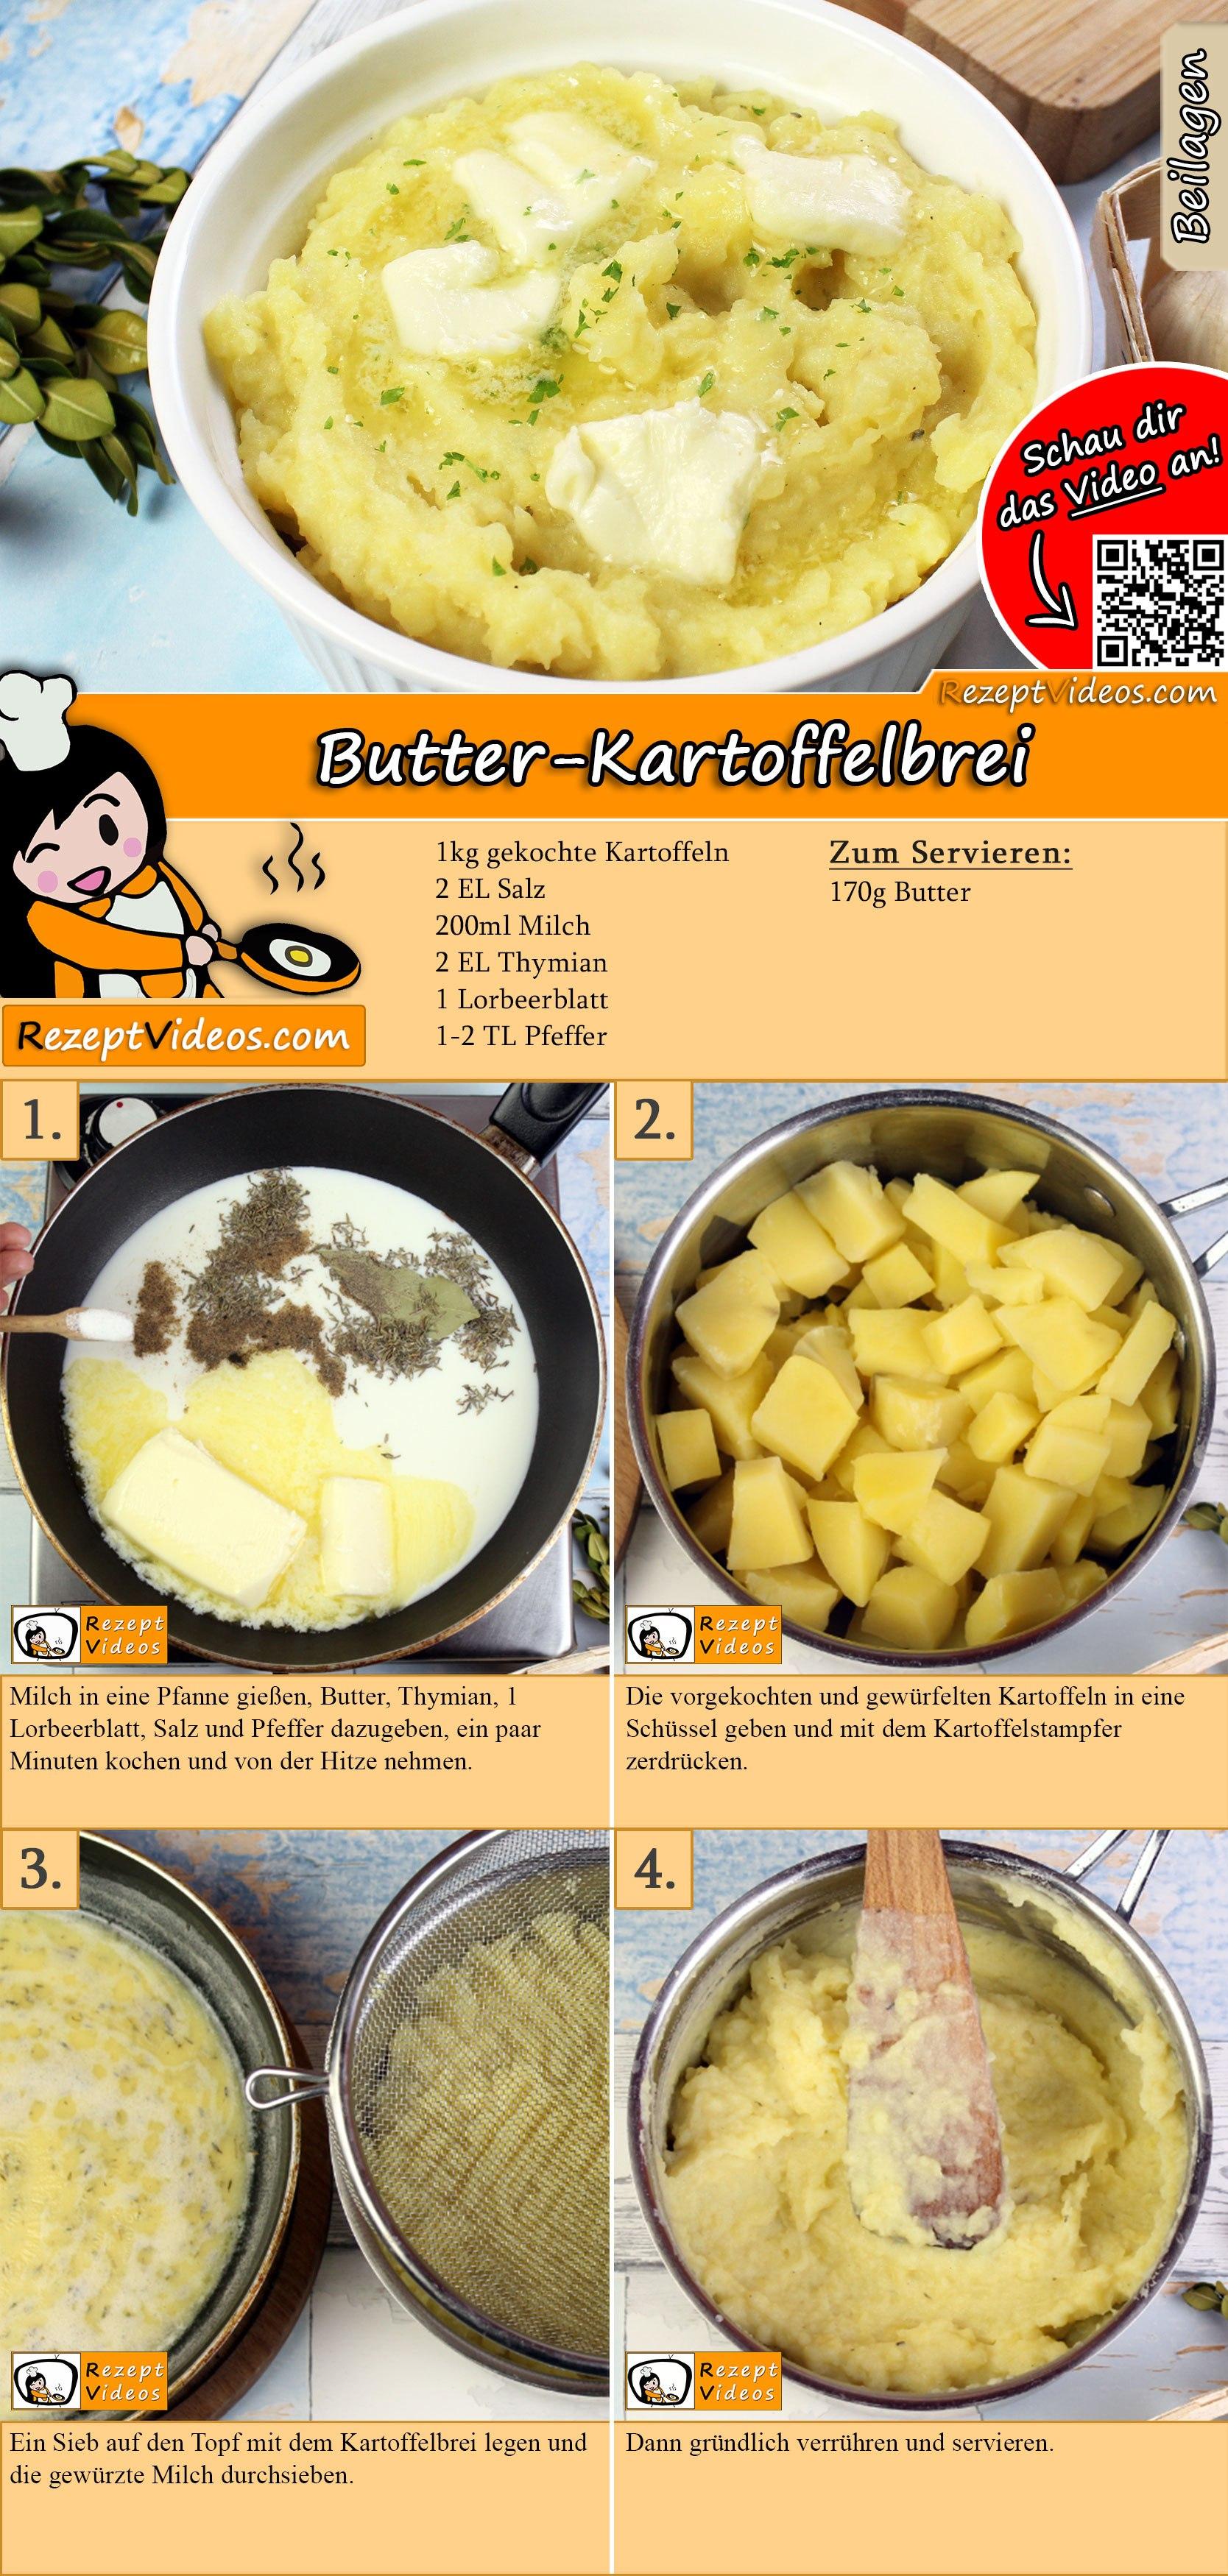 Butter-Kartoffelbrei Rezept mit Video